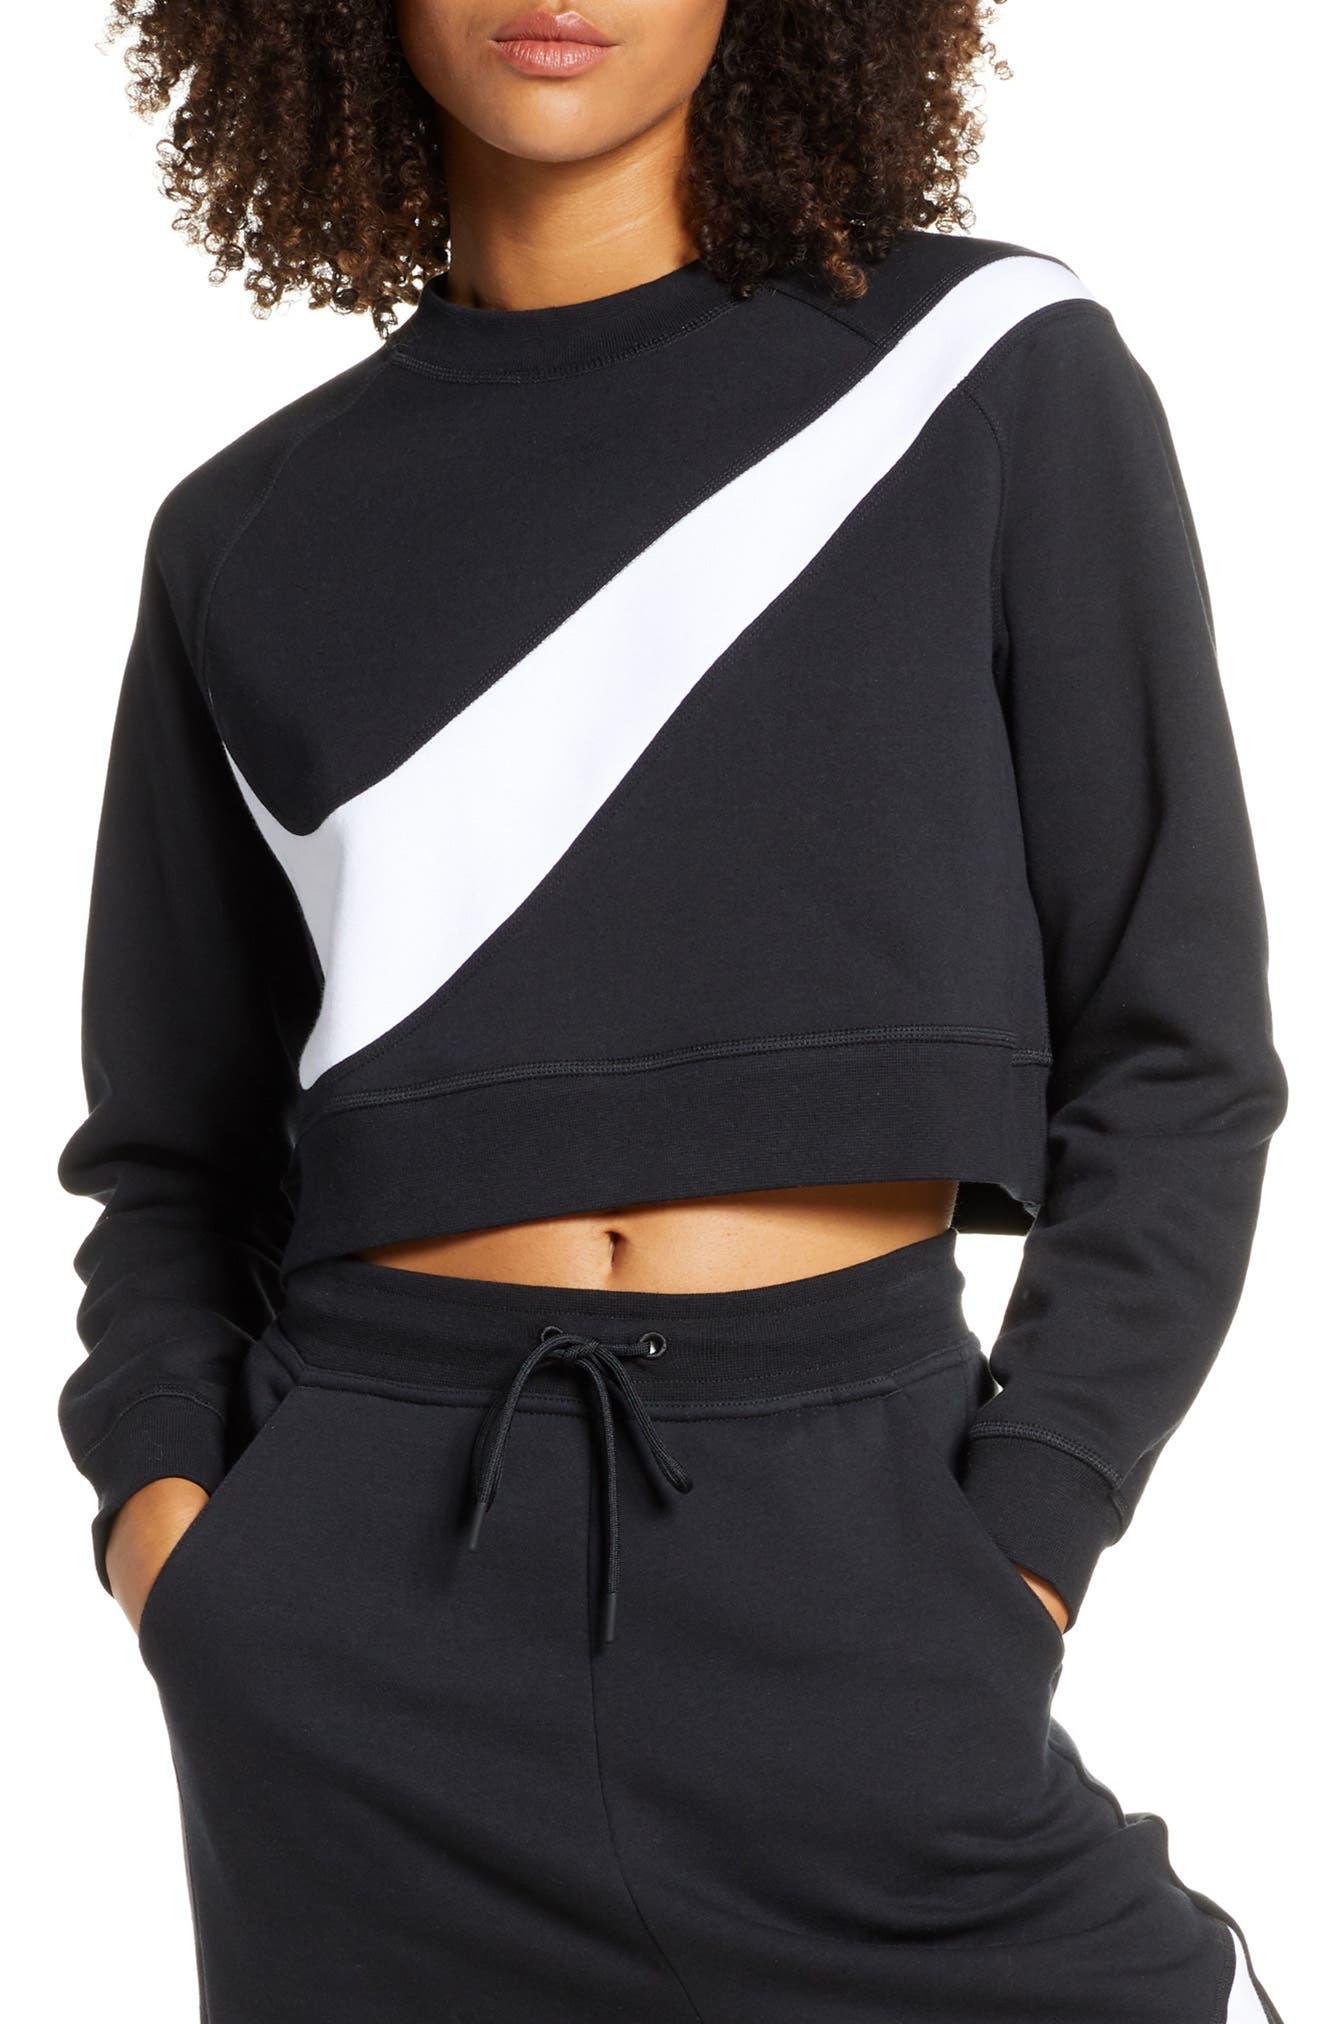 Nike Sportswear Swoosh Cropped Crewneck Sweatshirt